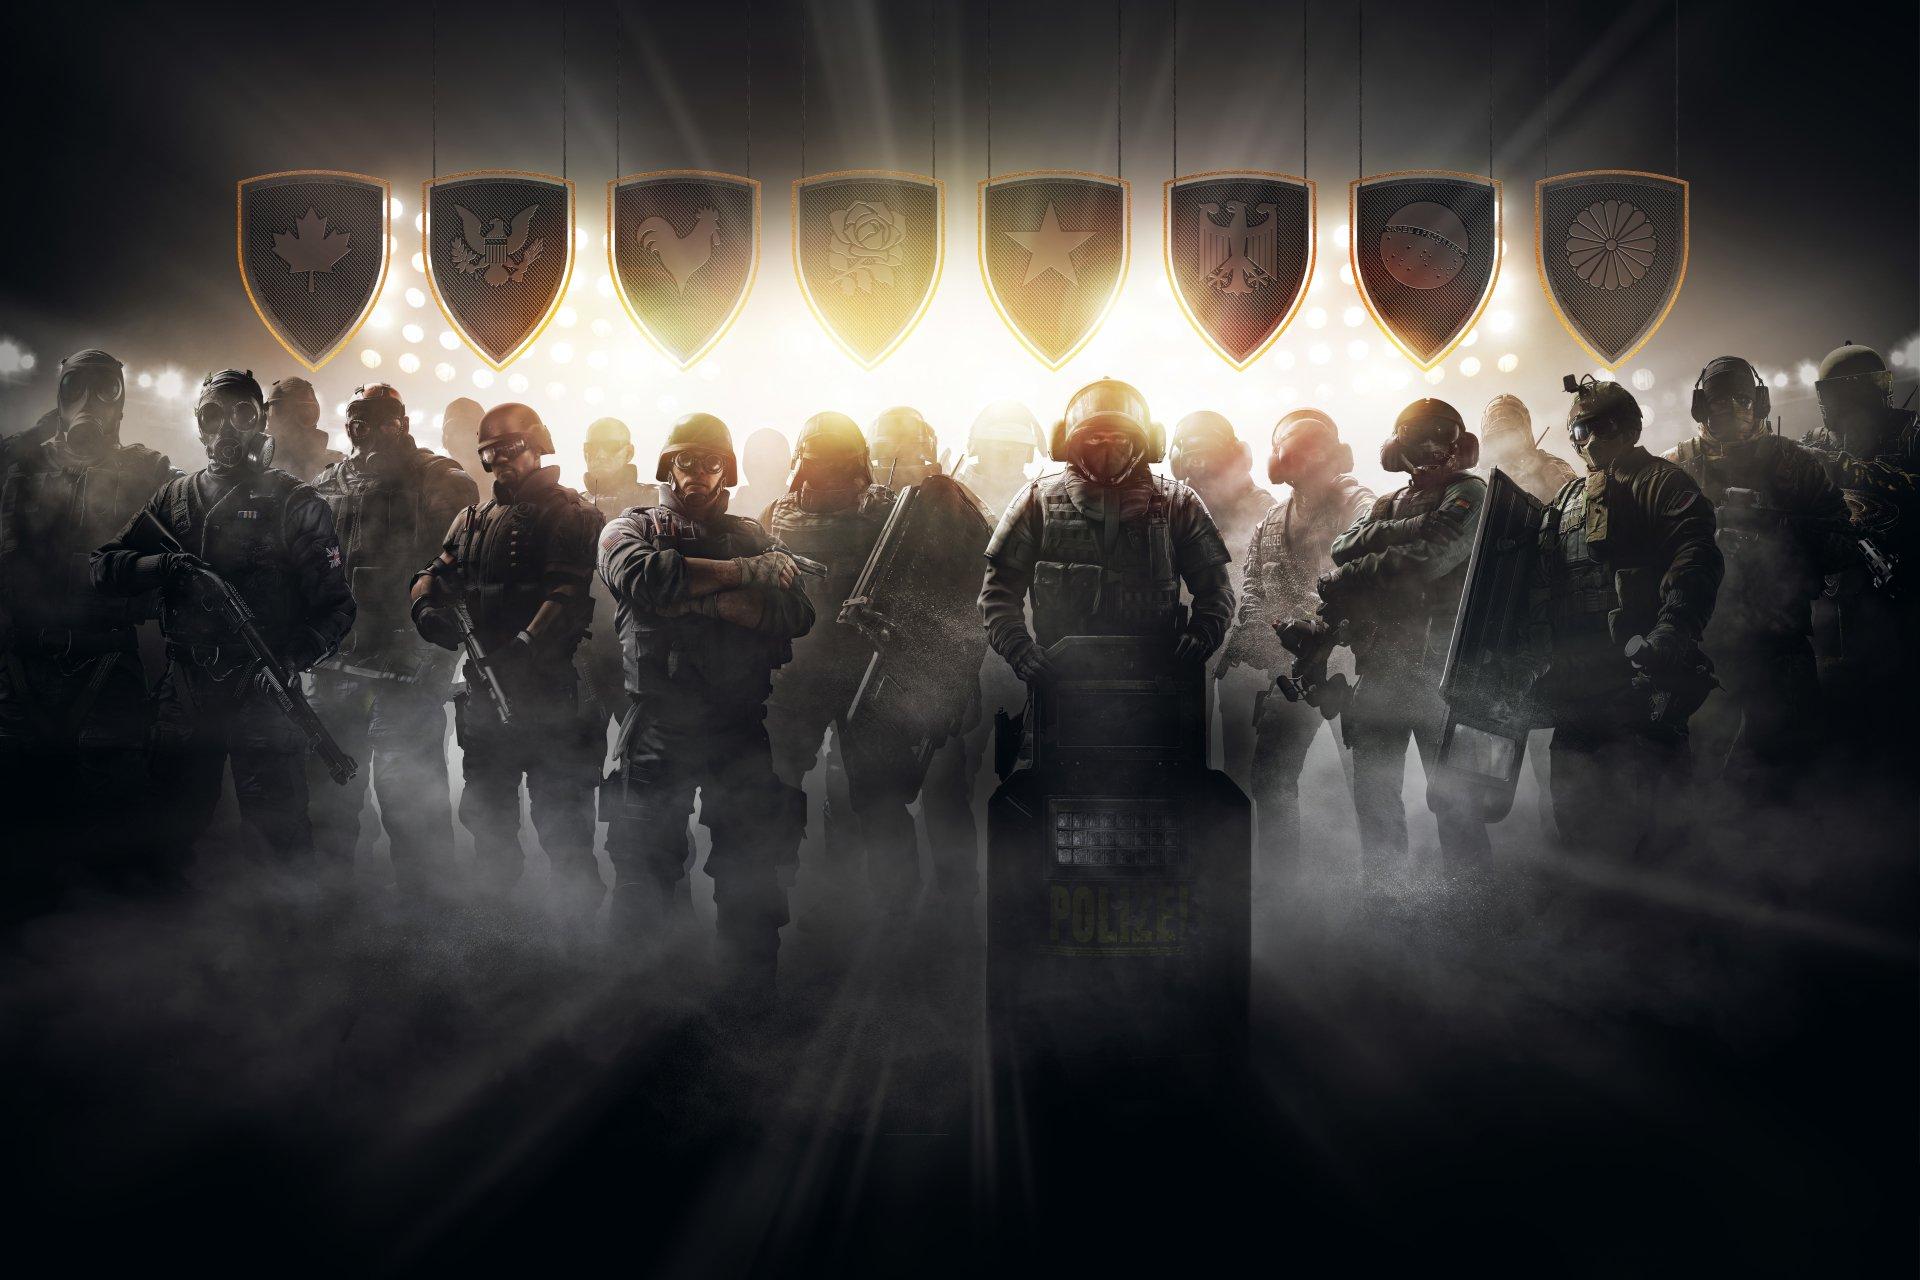 Video Game - Tom Clancy's Rainbow Six: Siege  Wallpaper